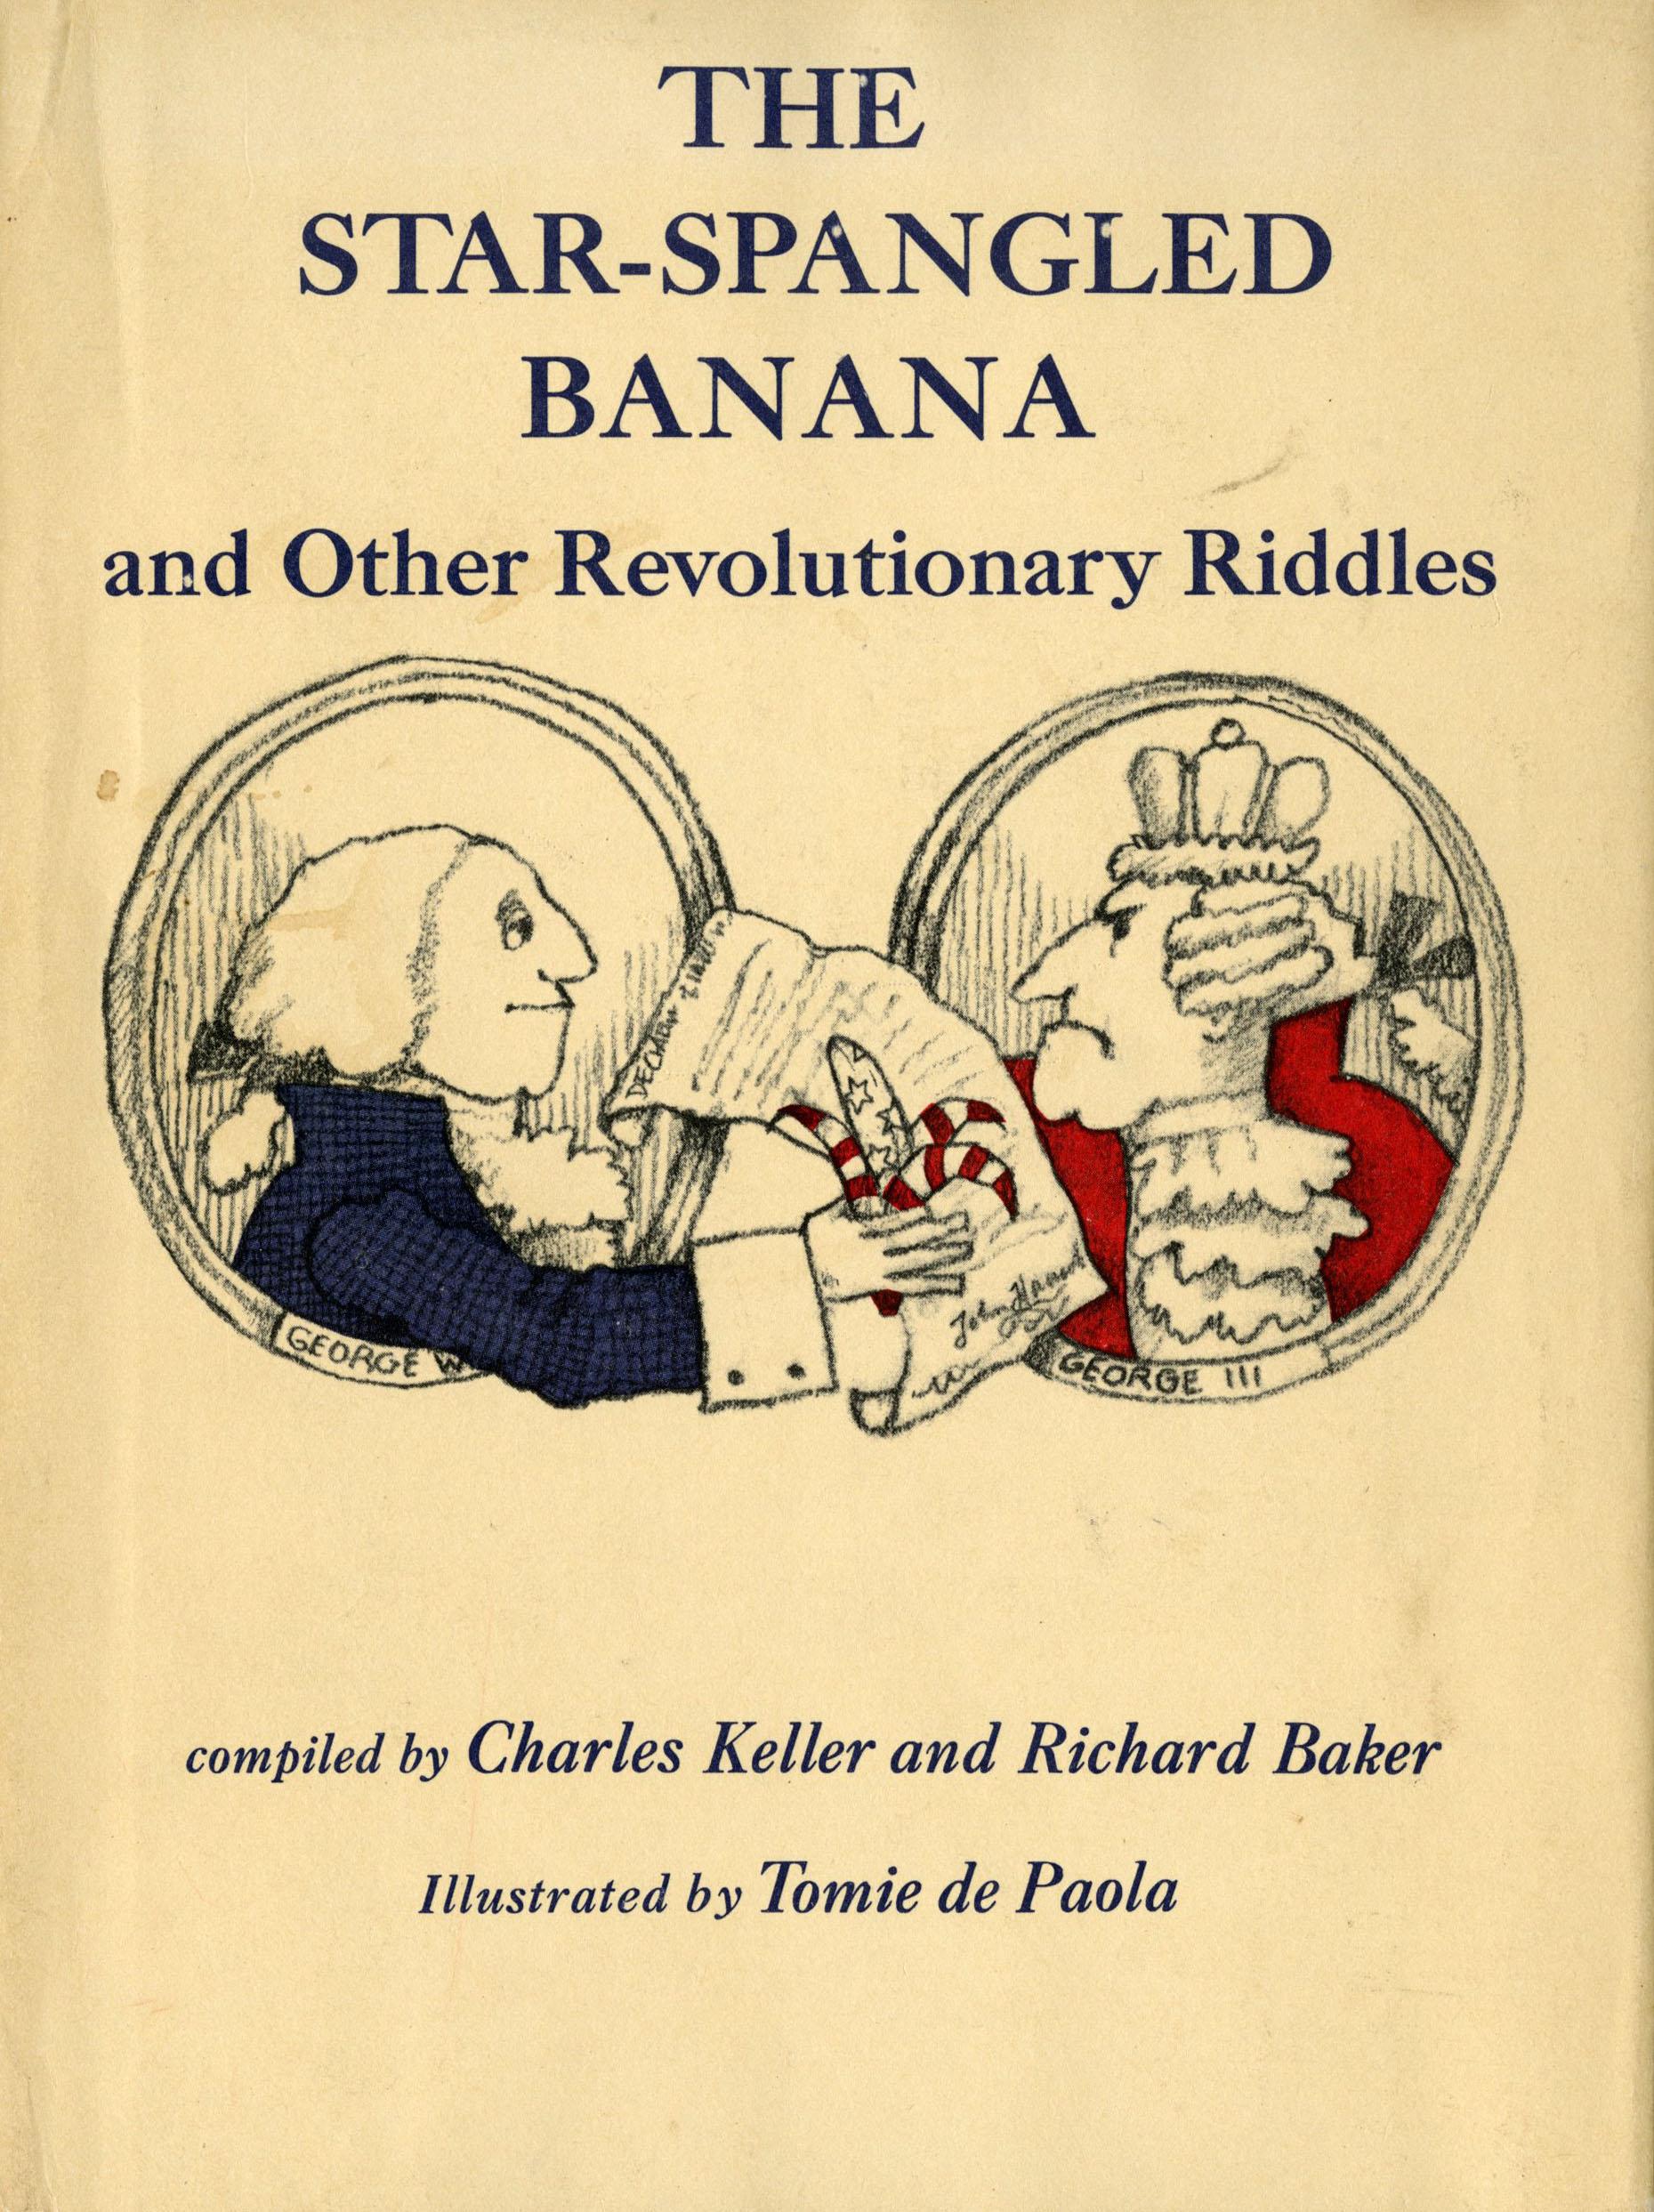 Star-Spangled Banana, The Cover.jpg